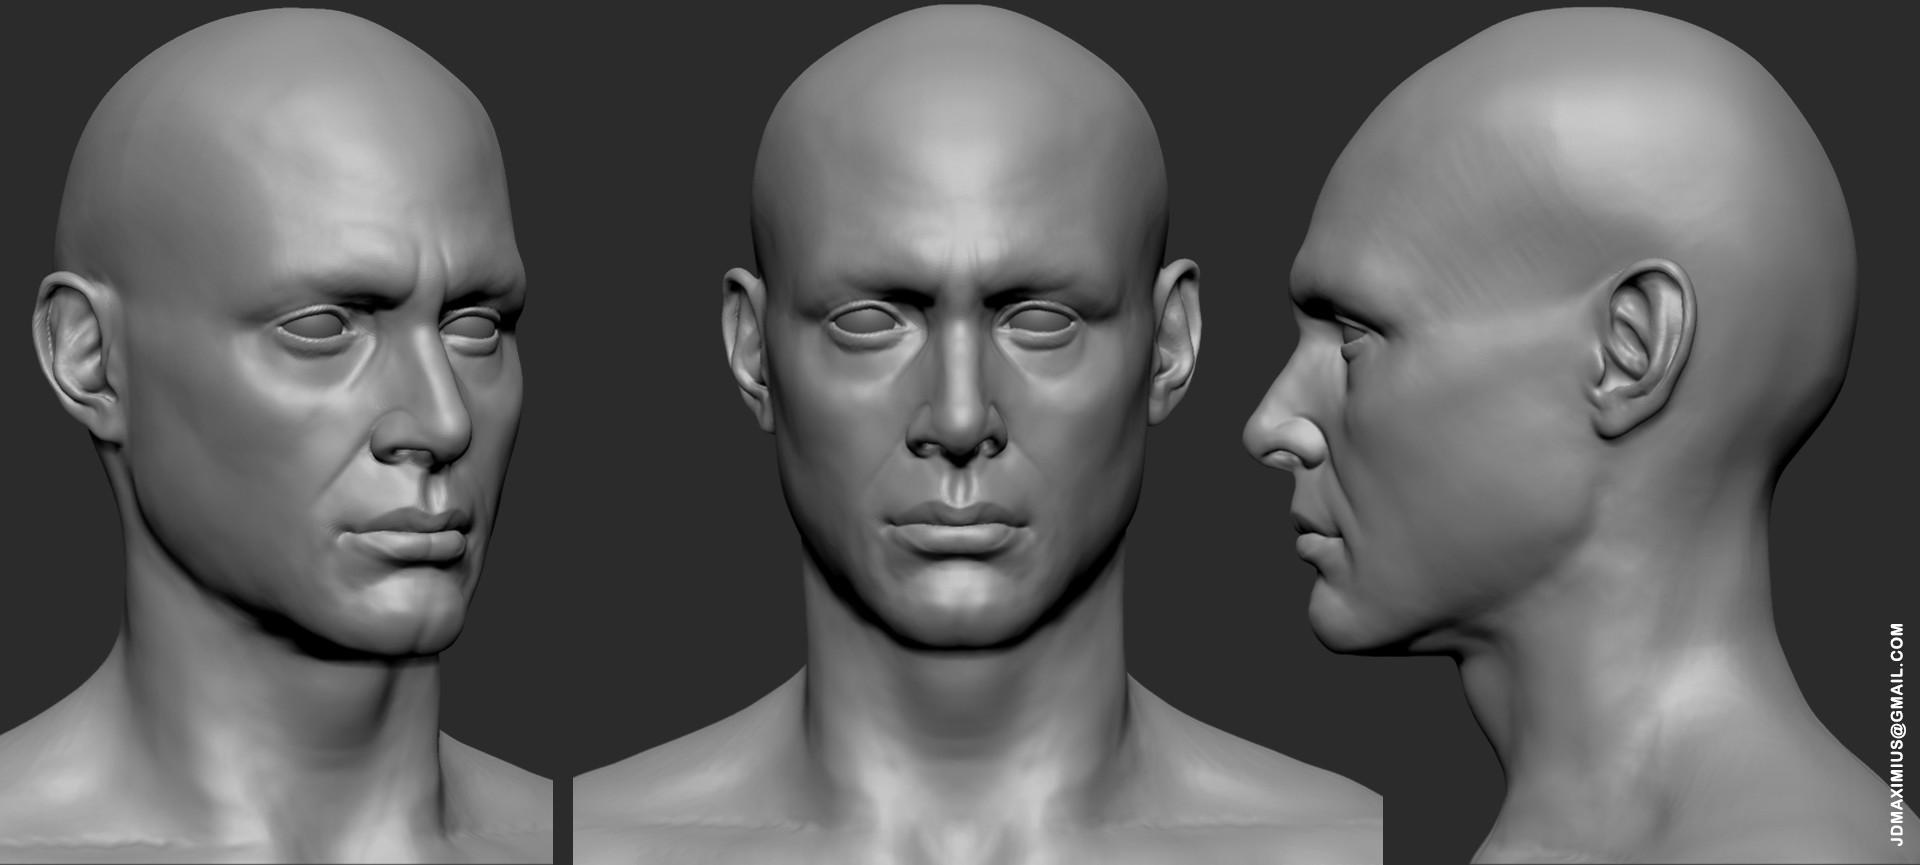 ArtStation - Anatomy Face Practice, Juan Diego Lugo